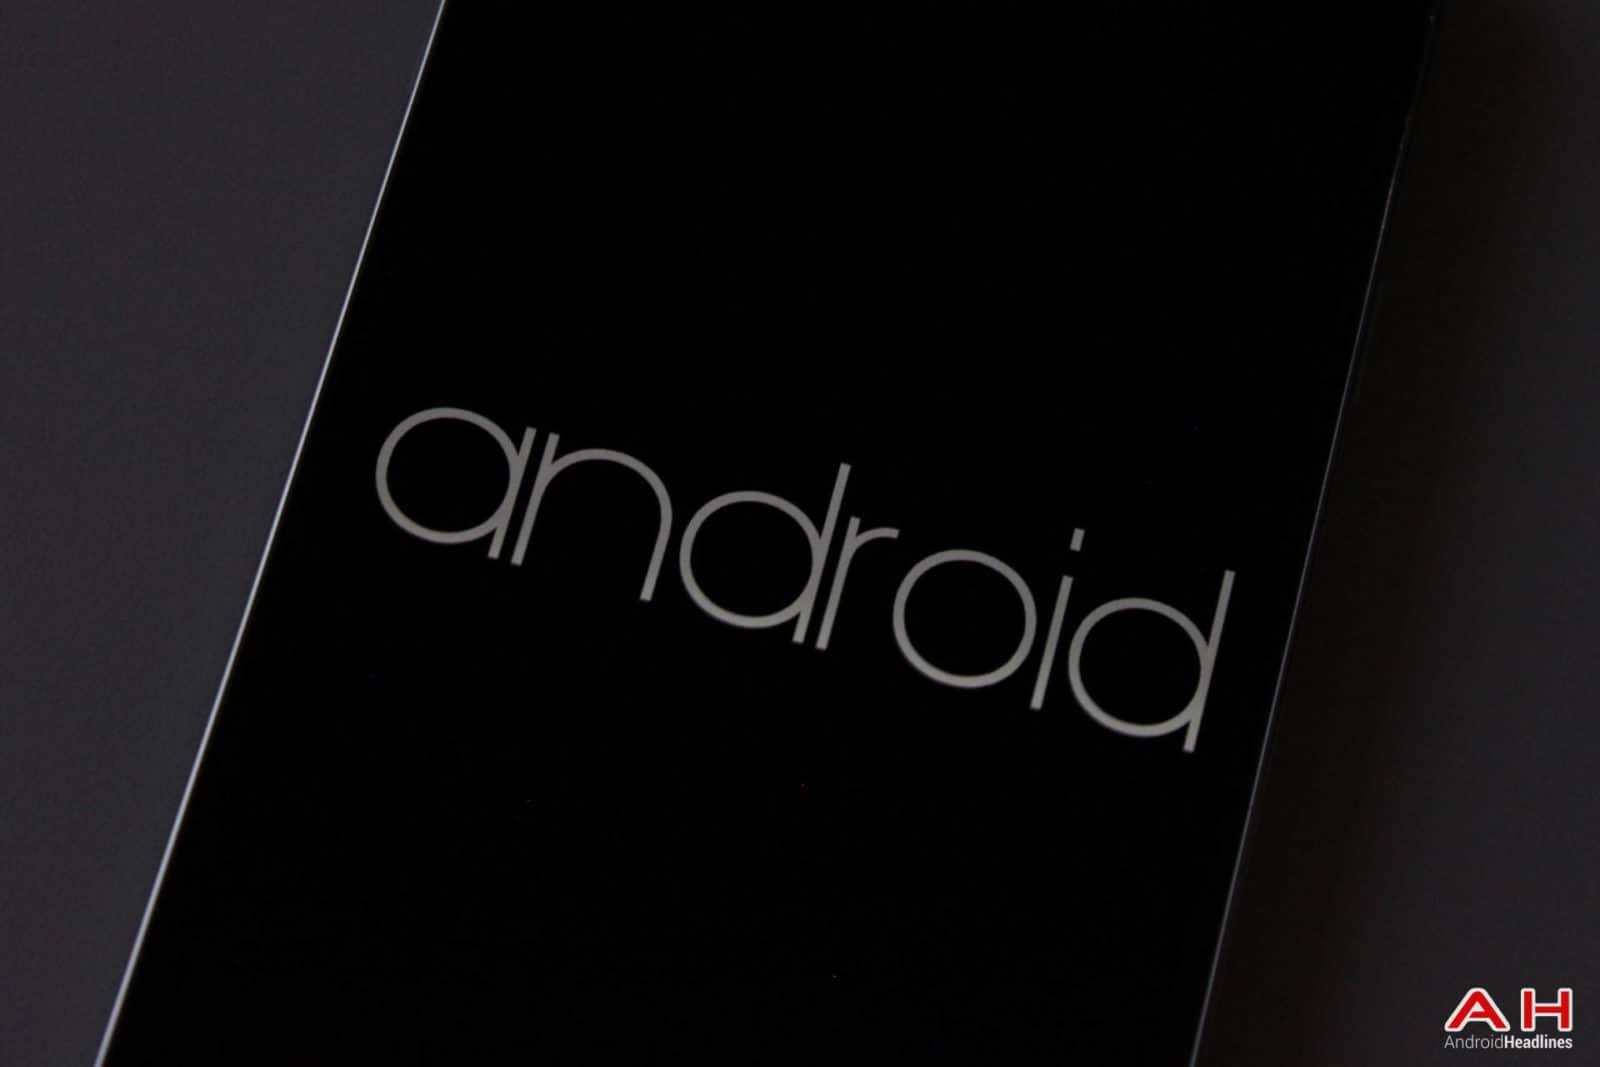 AH Android logo Dark 1.0